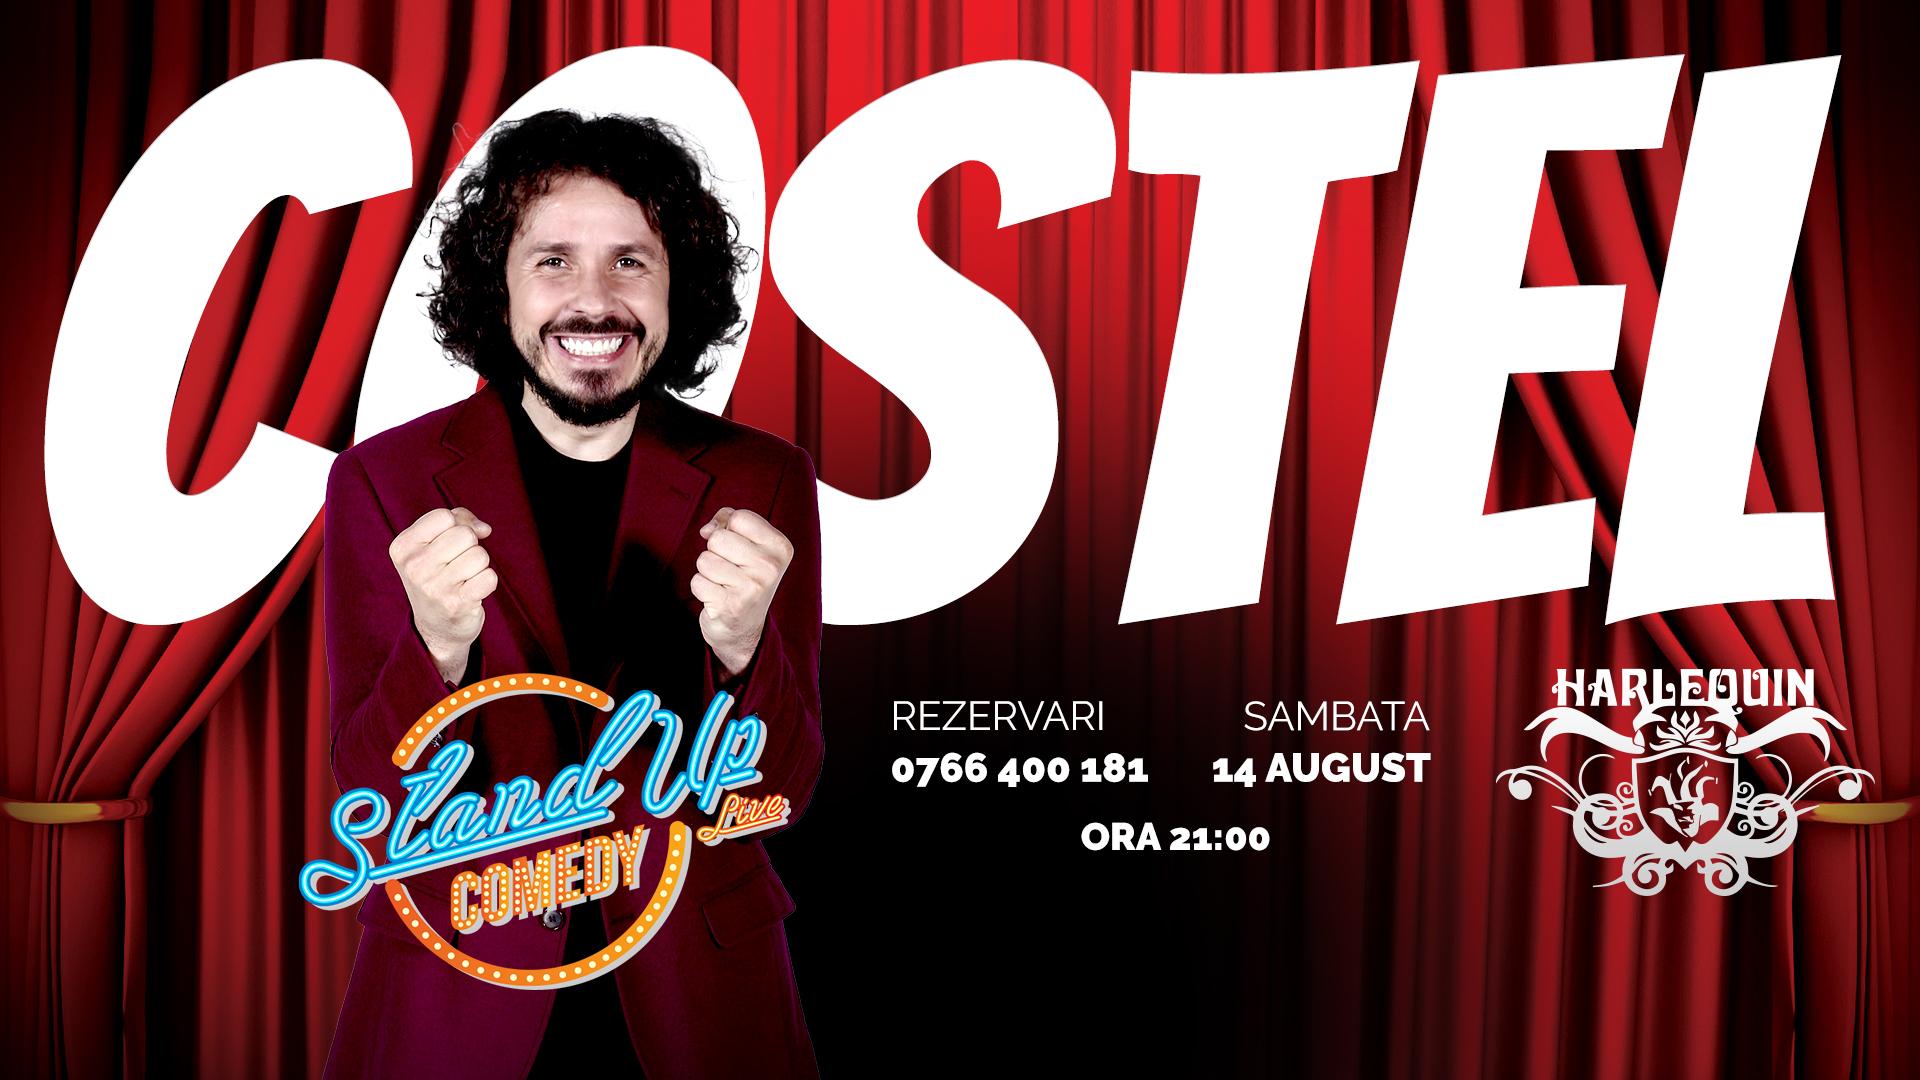 Standup comedy cu COSTEL pe 14 august la Harlequin Mamaia